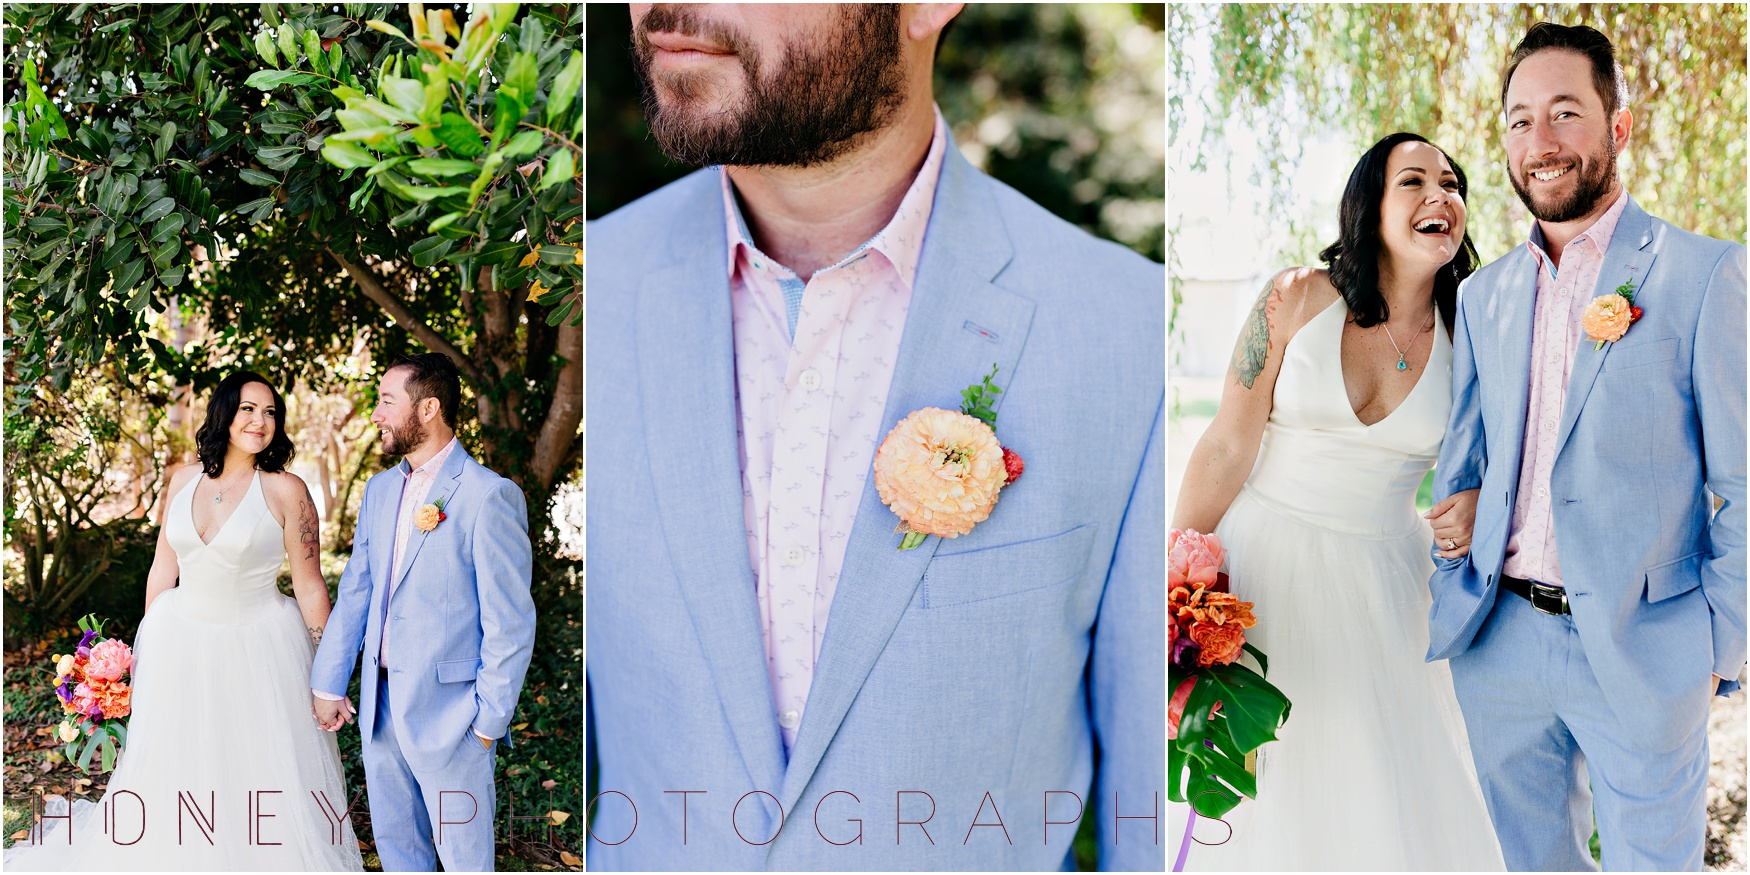 colorful_ecclectic_vibrant_vista_rainbow_quirky_wedding030.jpg